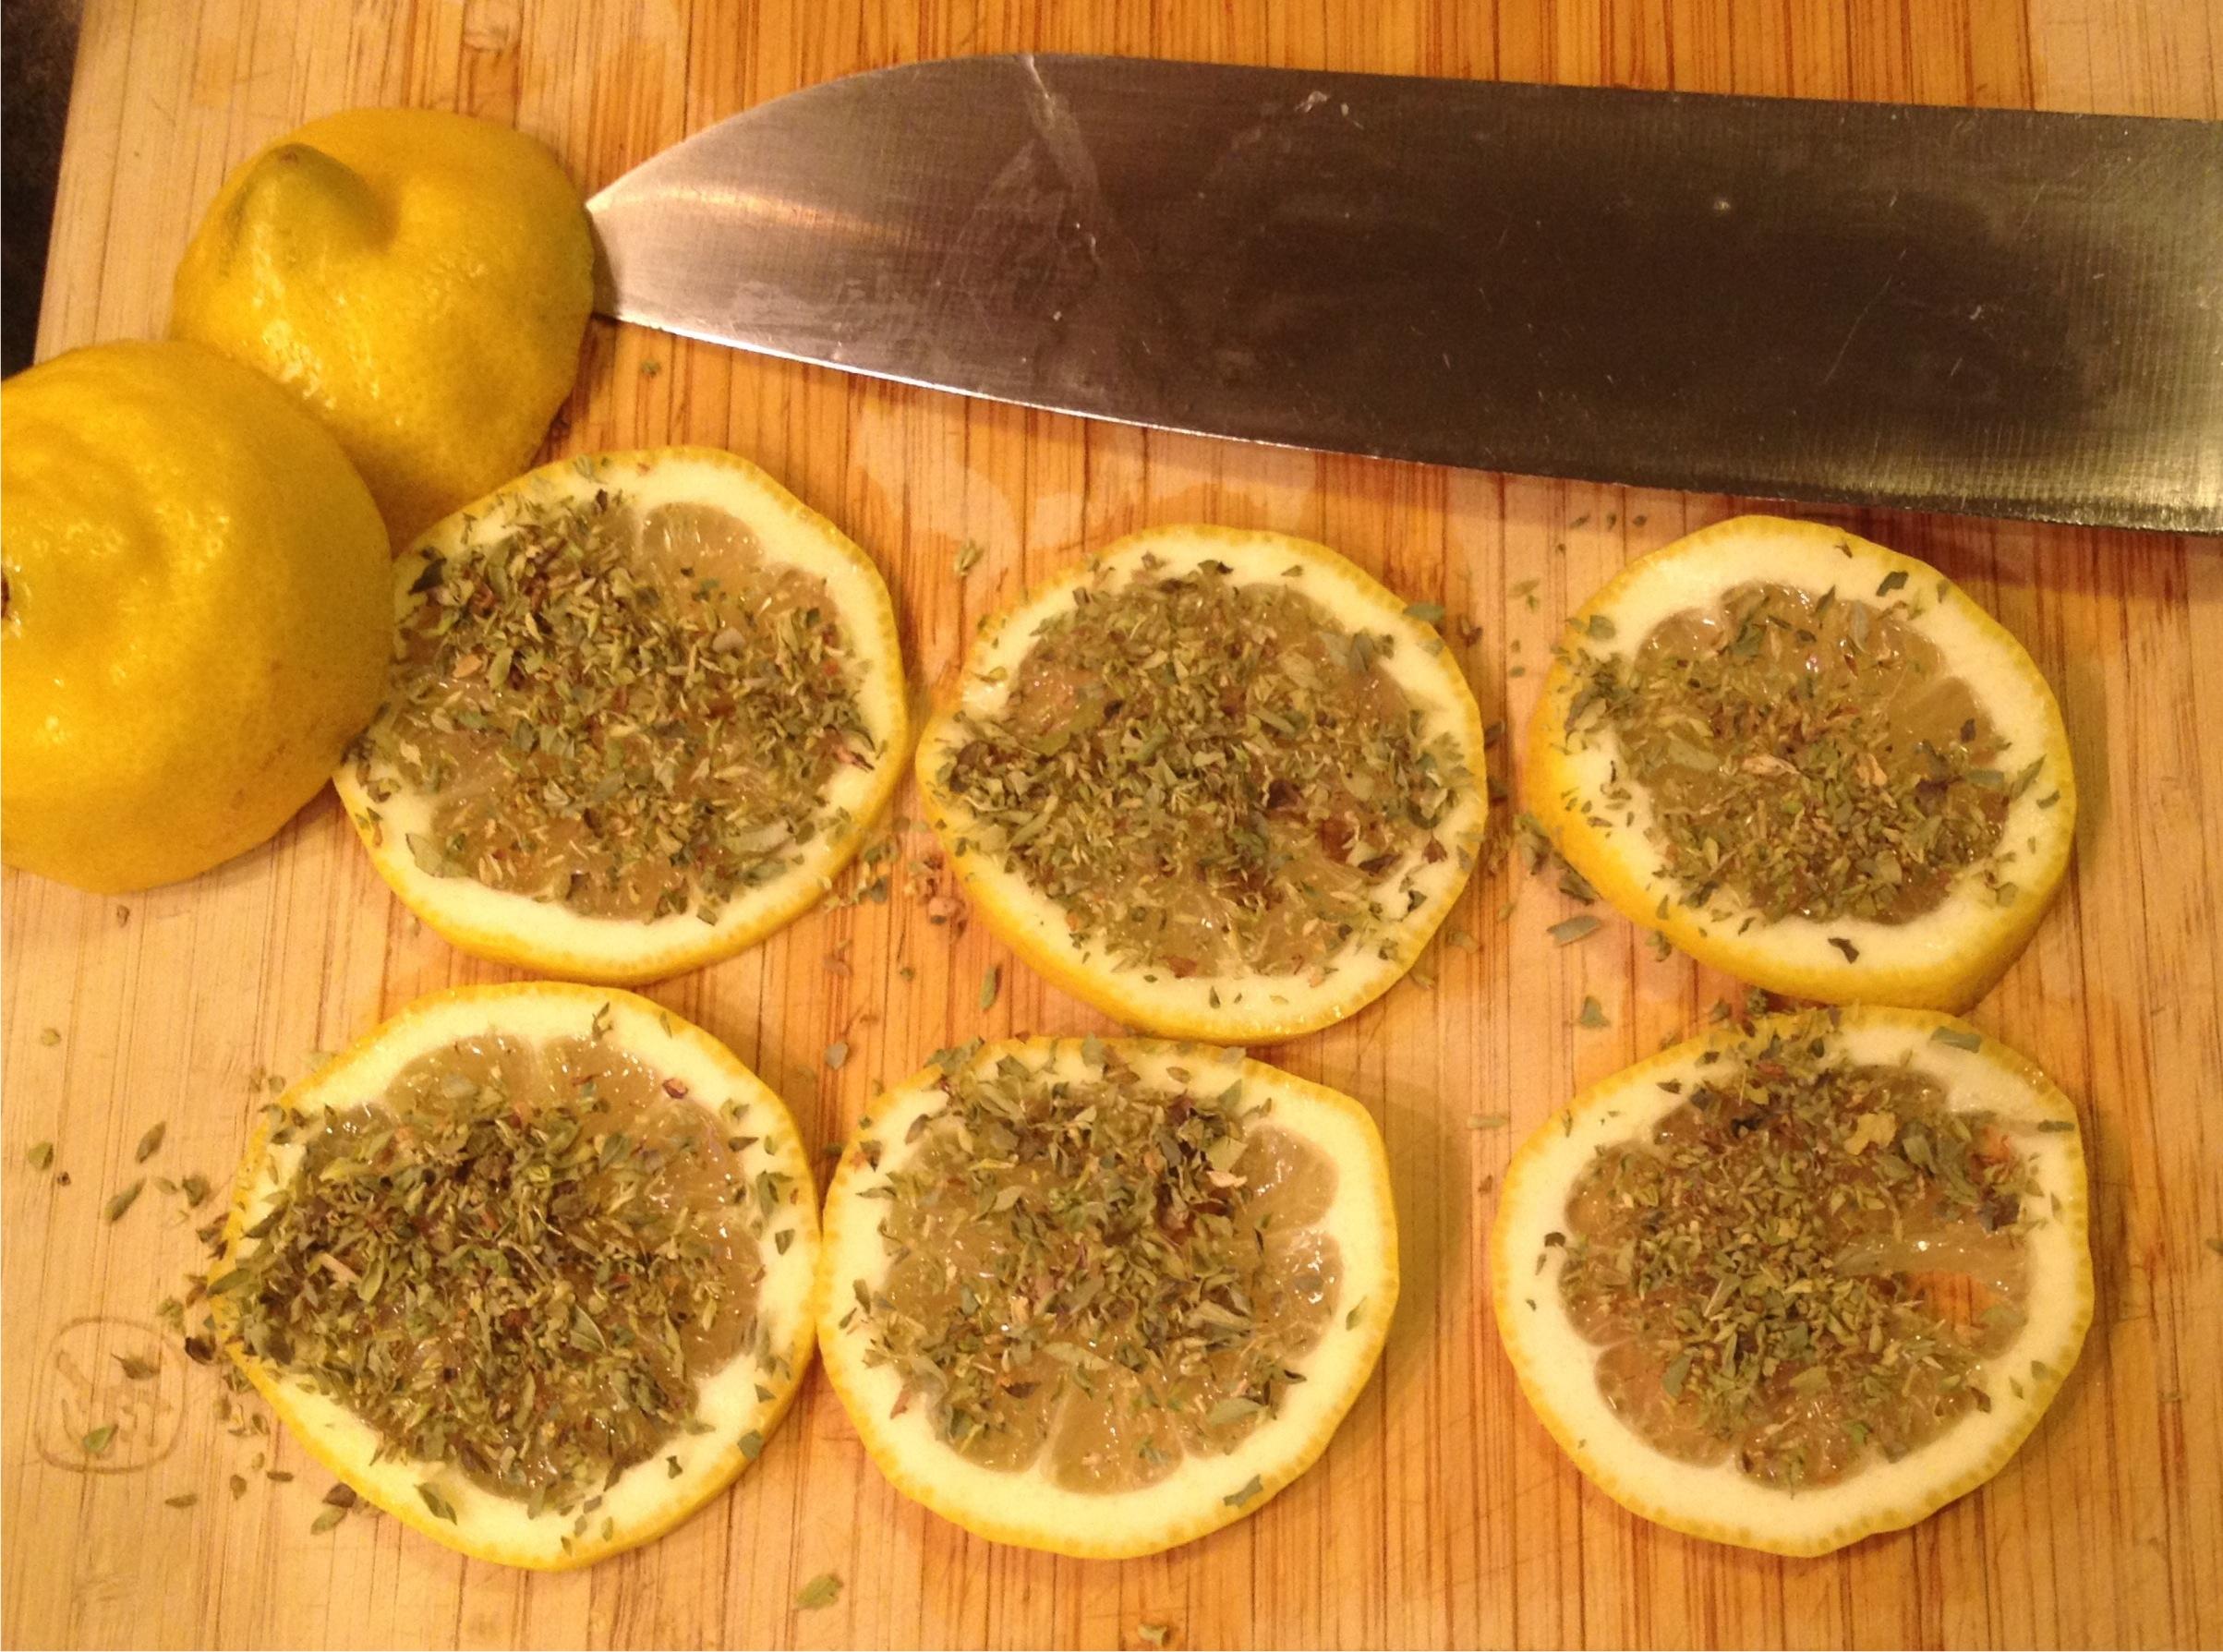 lemon slices covered with Greek oregano